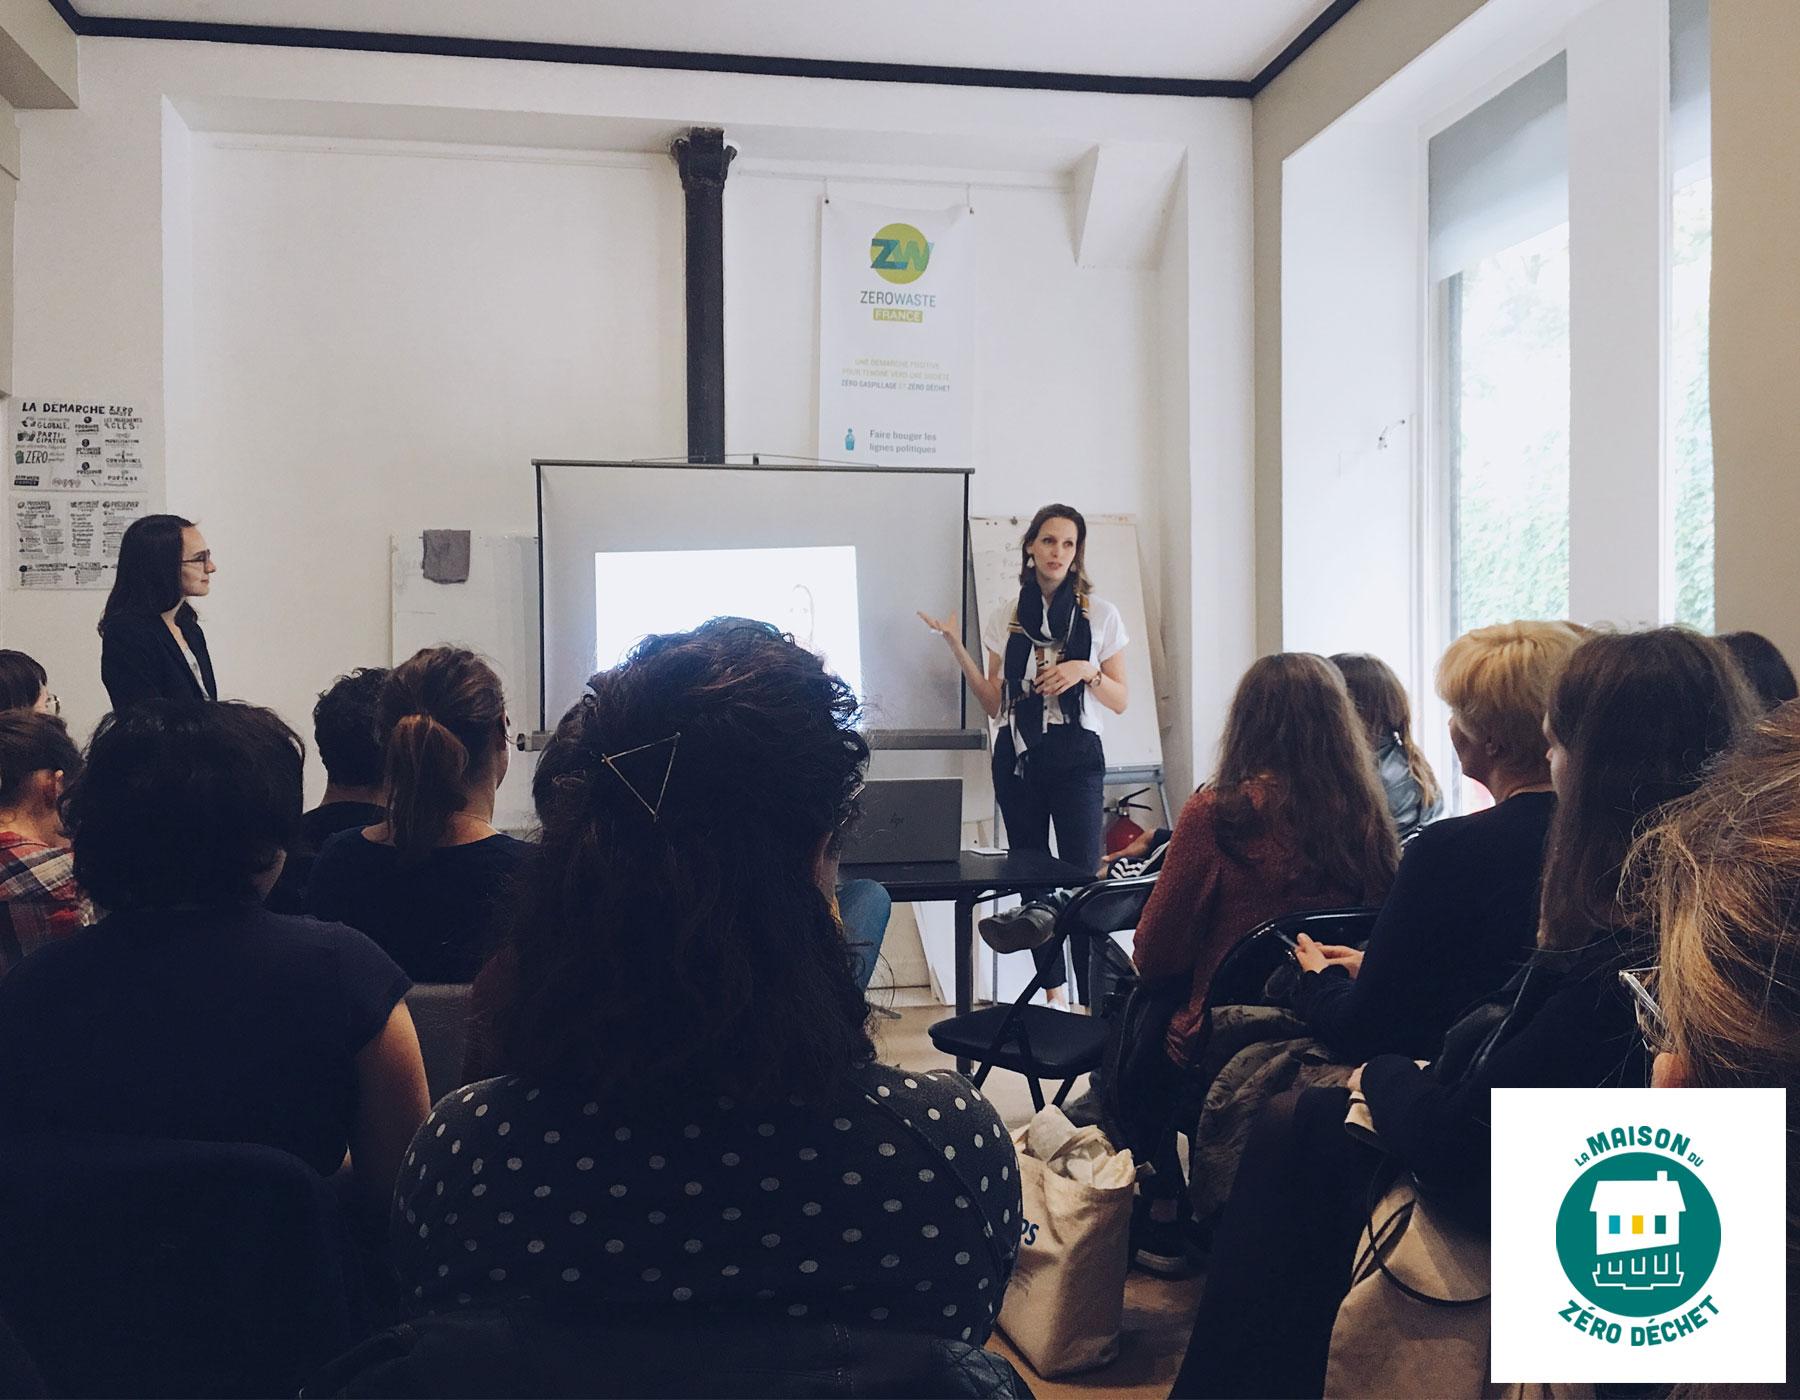 Talk about Zero Waste and sustainability at Maison du Zero Dechet - France - June 2019